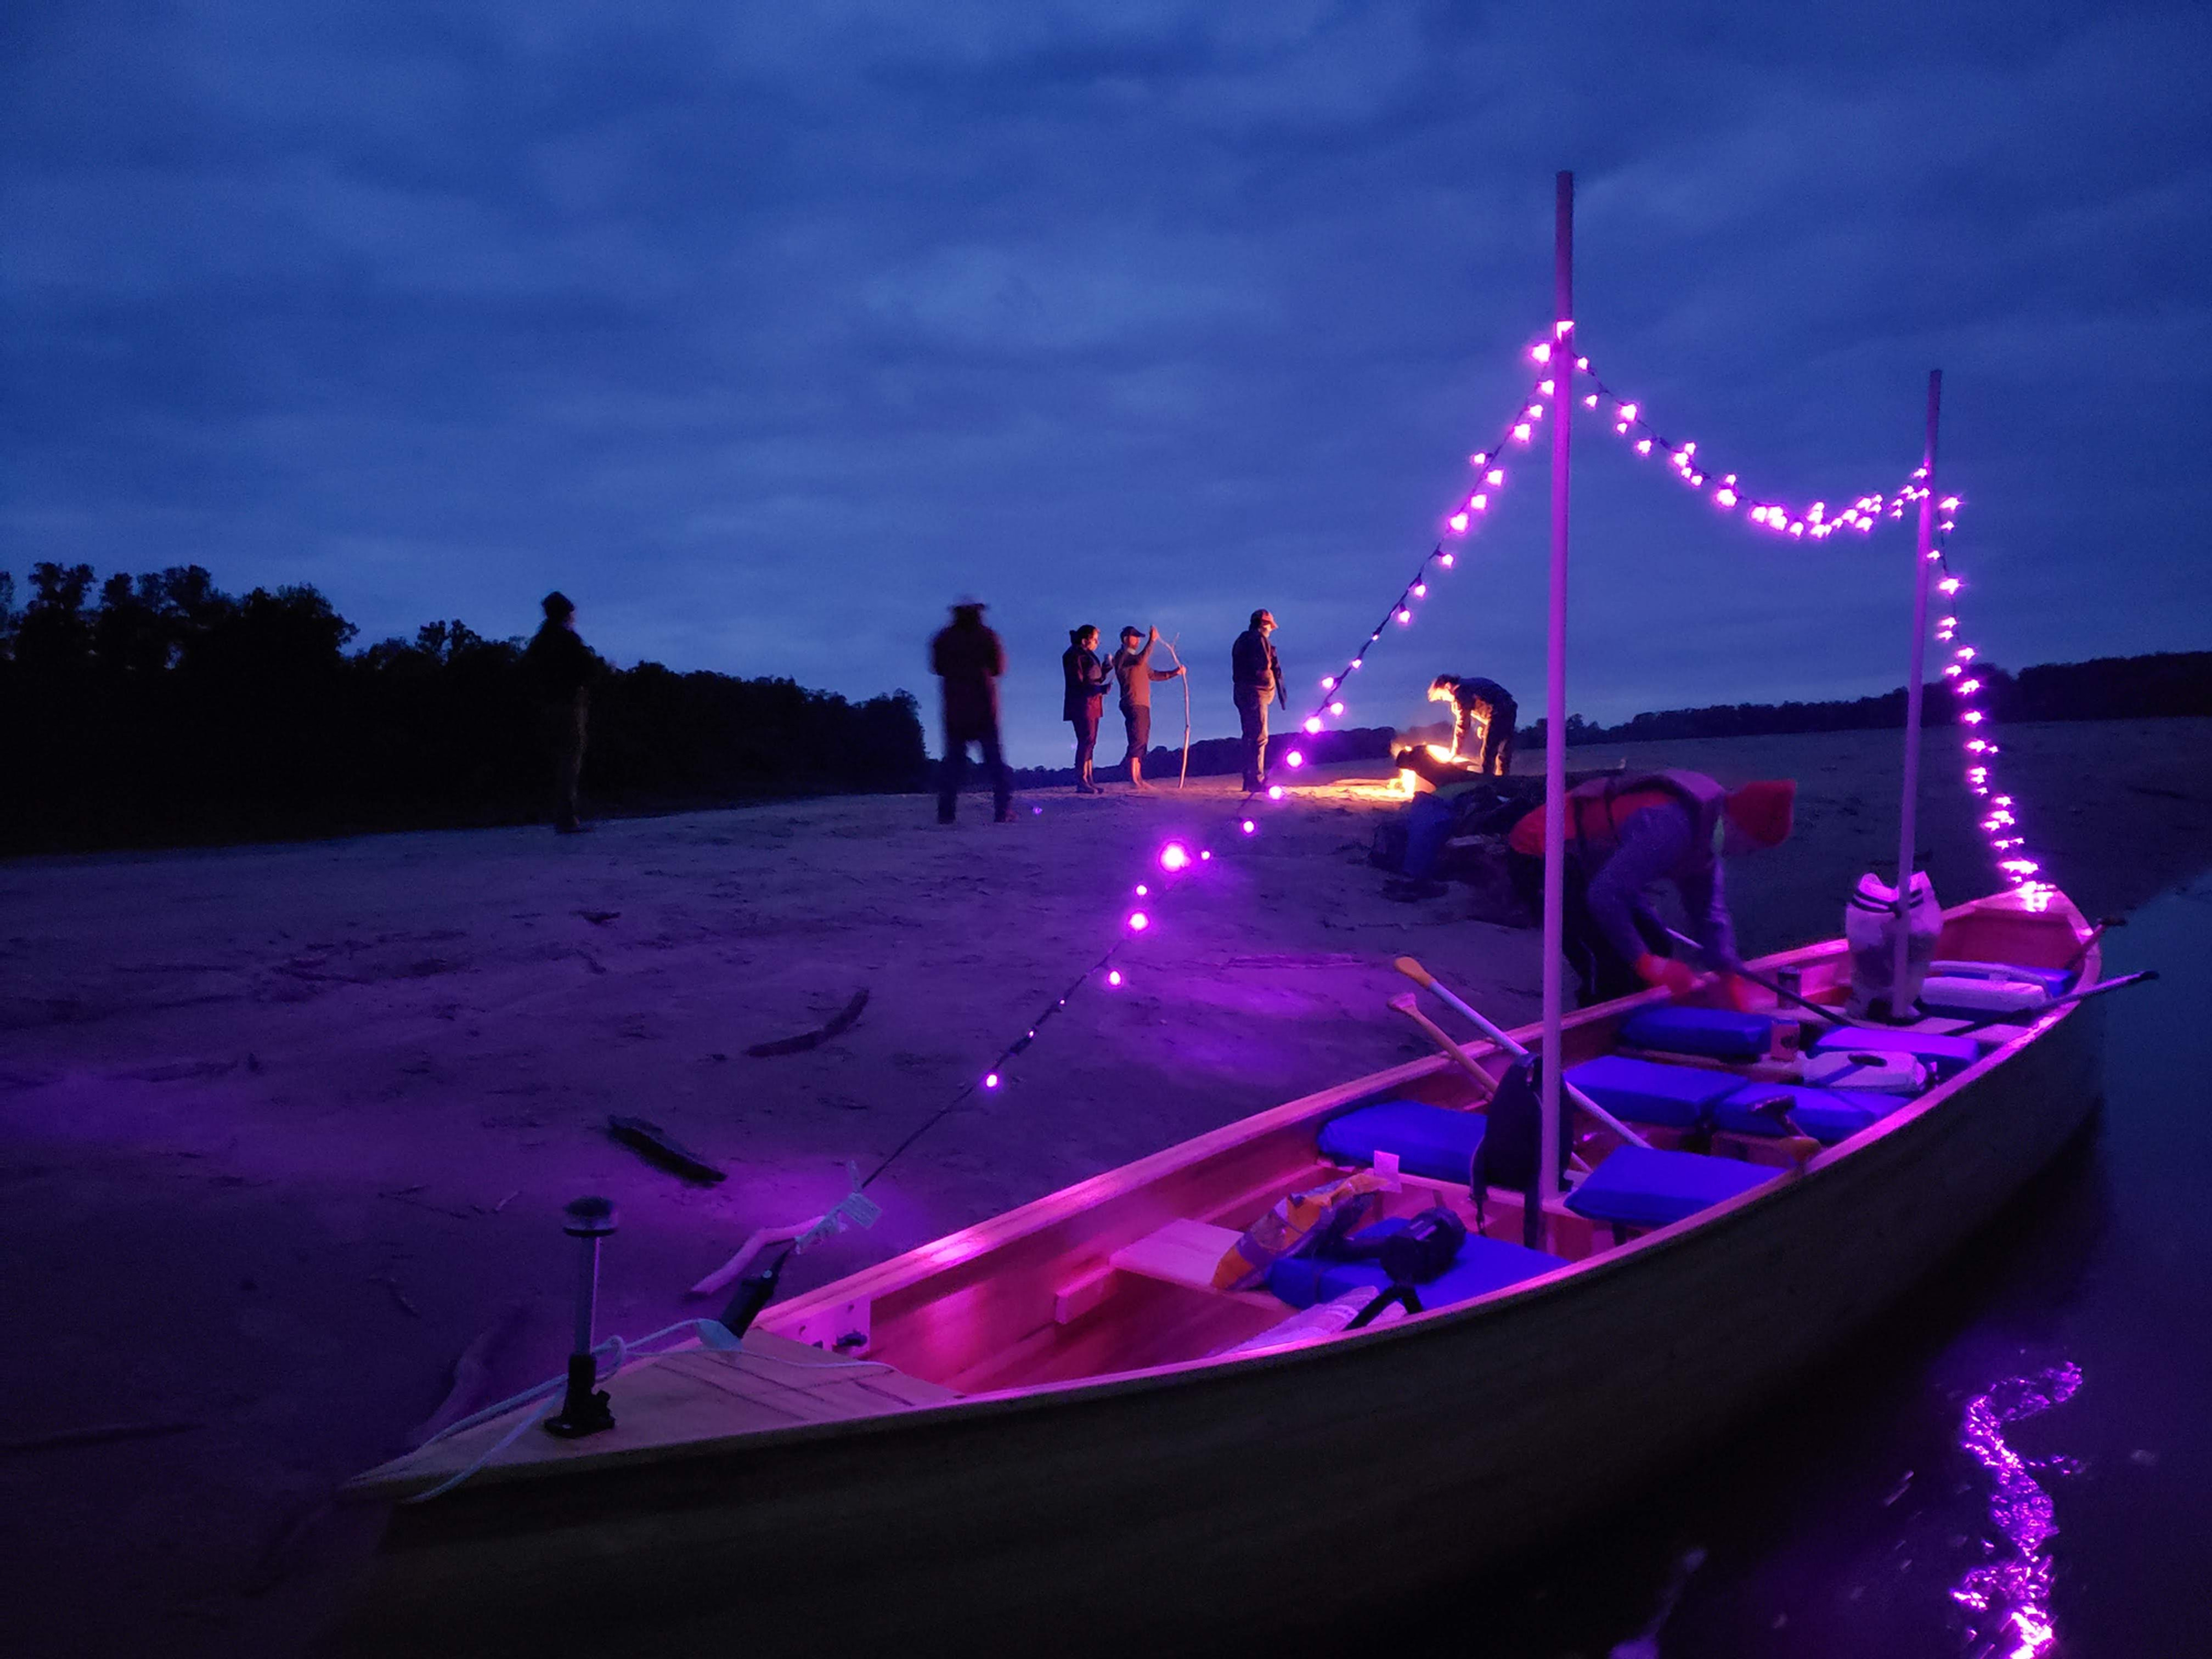 Full Moon Paddle: Voyager Canoe